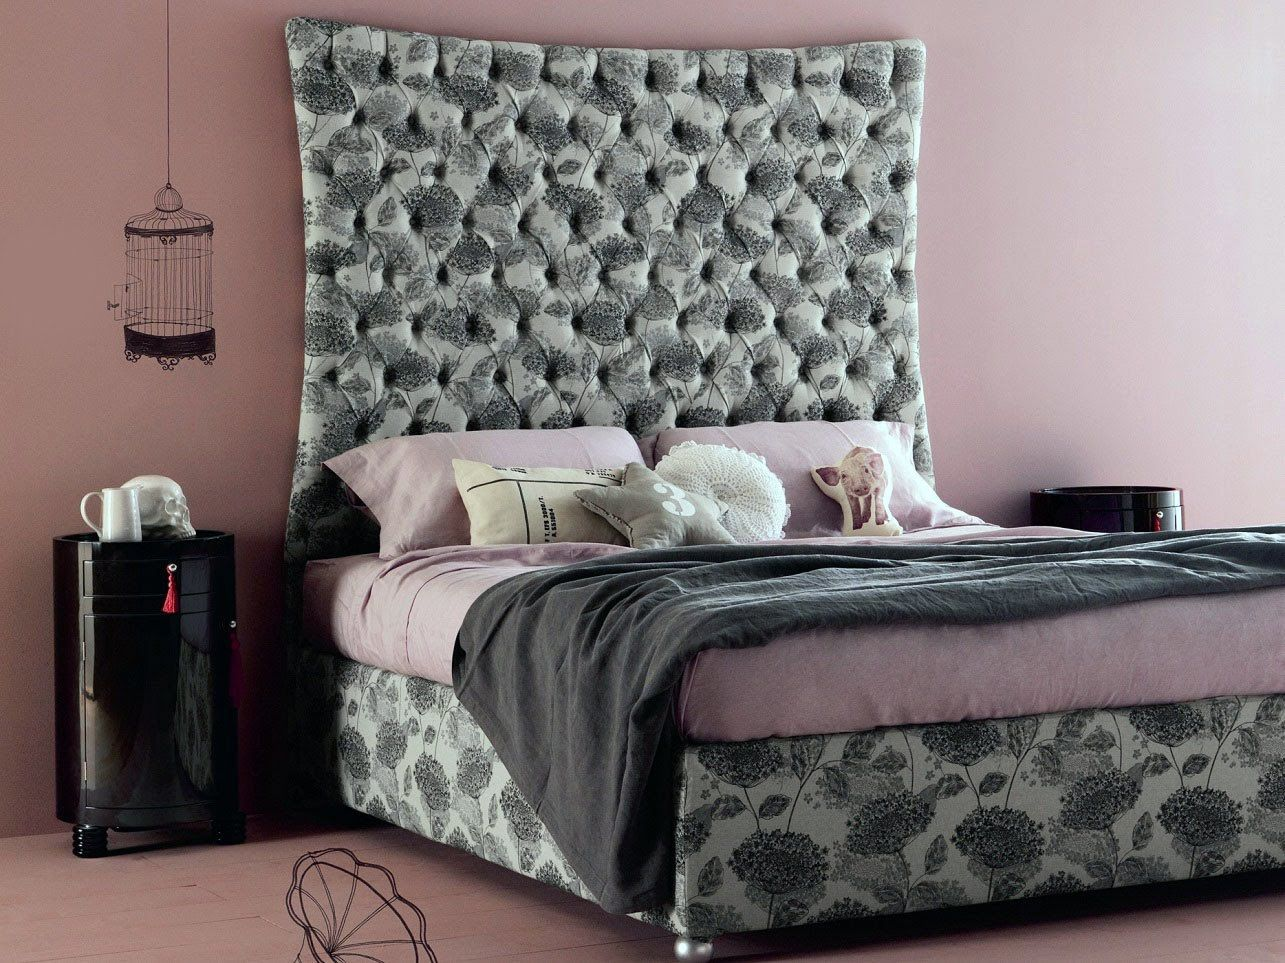 Diy fabric headboard & Diy fabric headboard slipcover | Decorating Ideas | Pinterest ... pillowsntoast.com